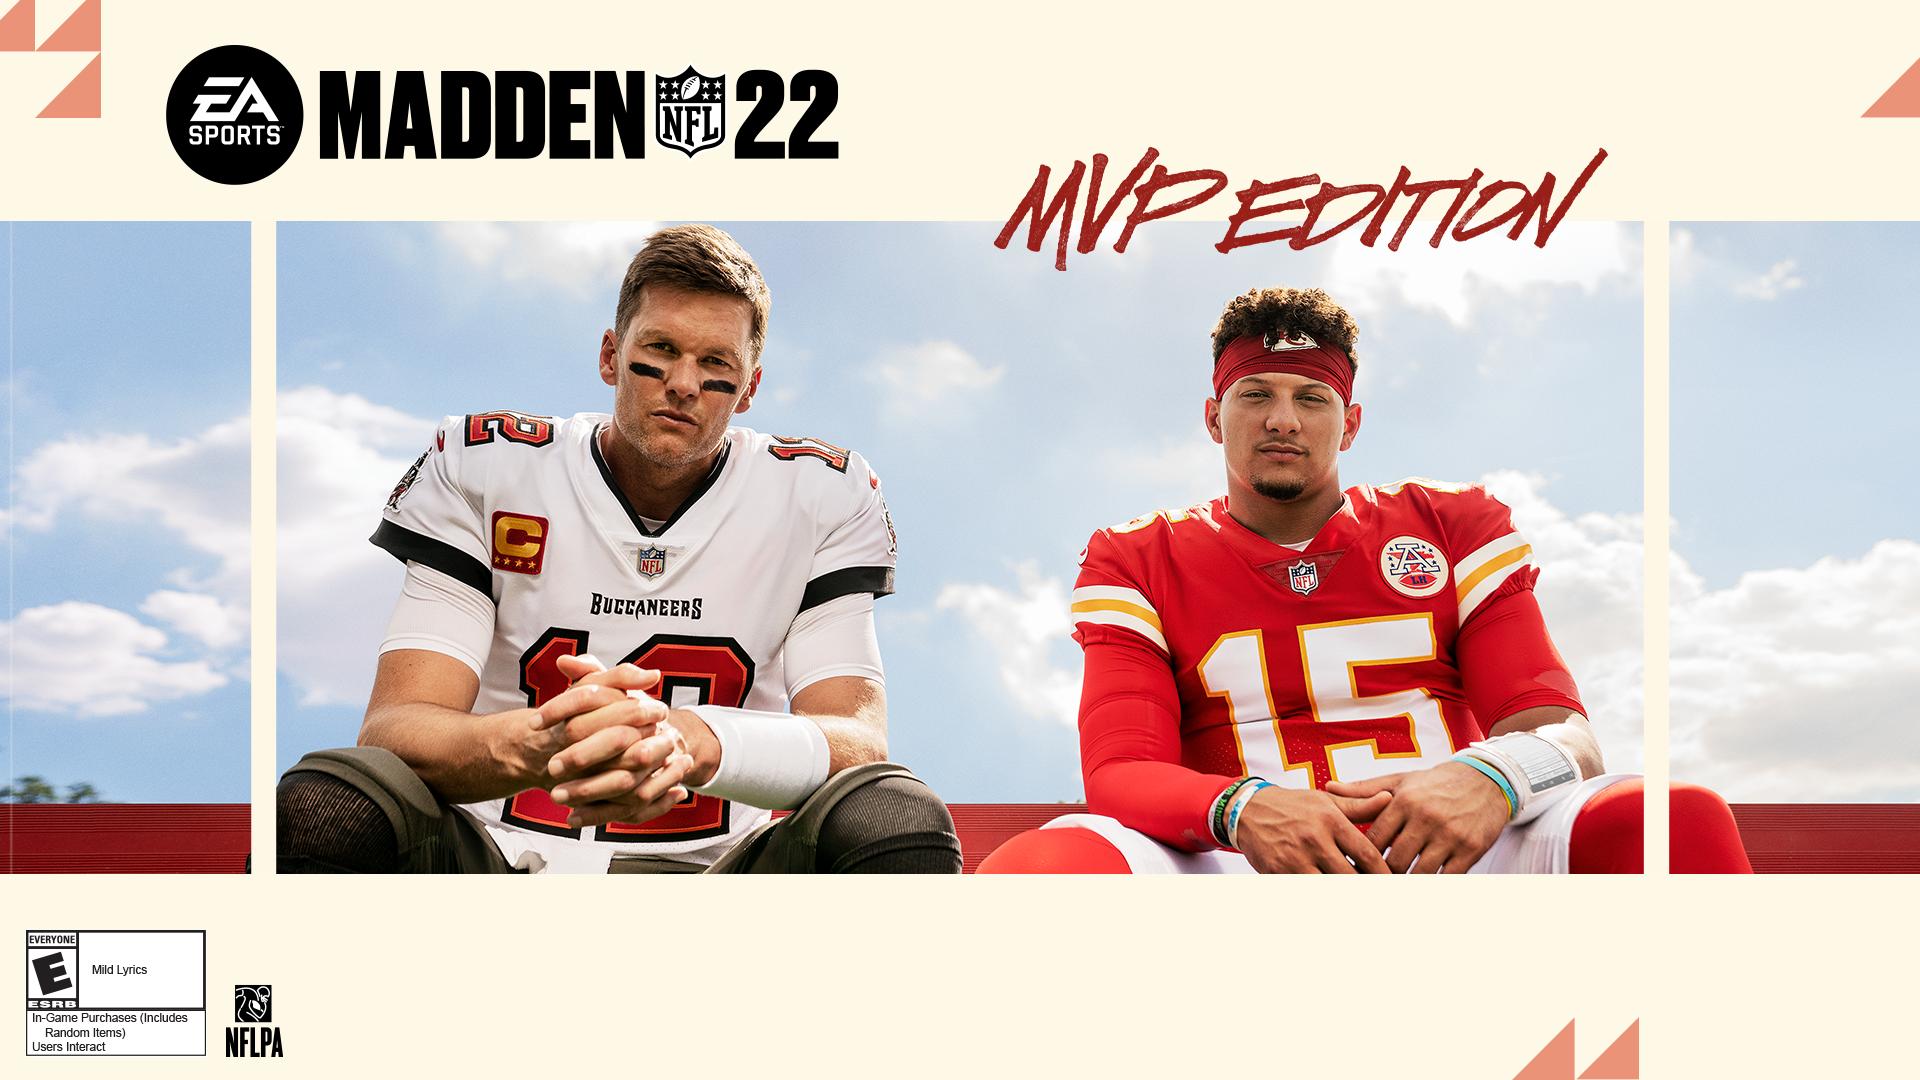 Tom Brady, Patrick Mahomes co-star on cover of 'Madden NFL 2022'